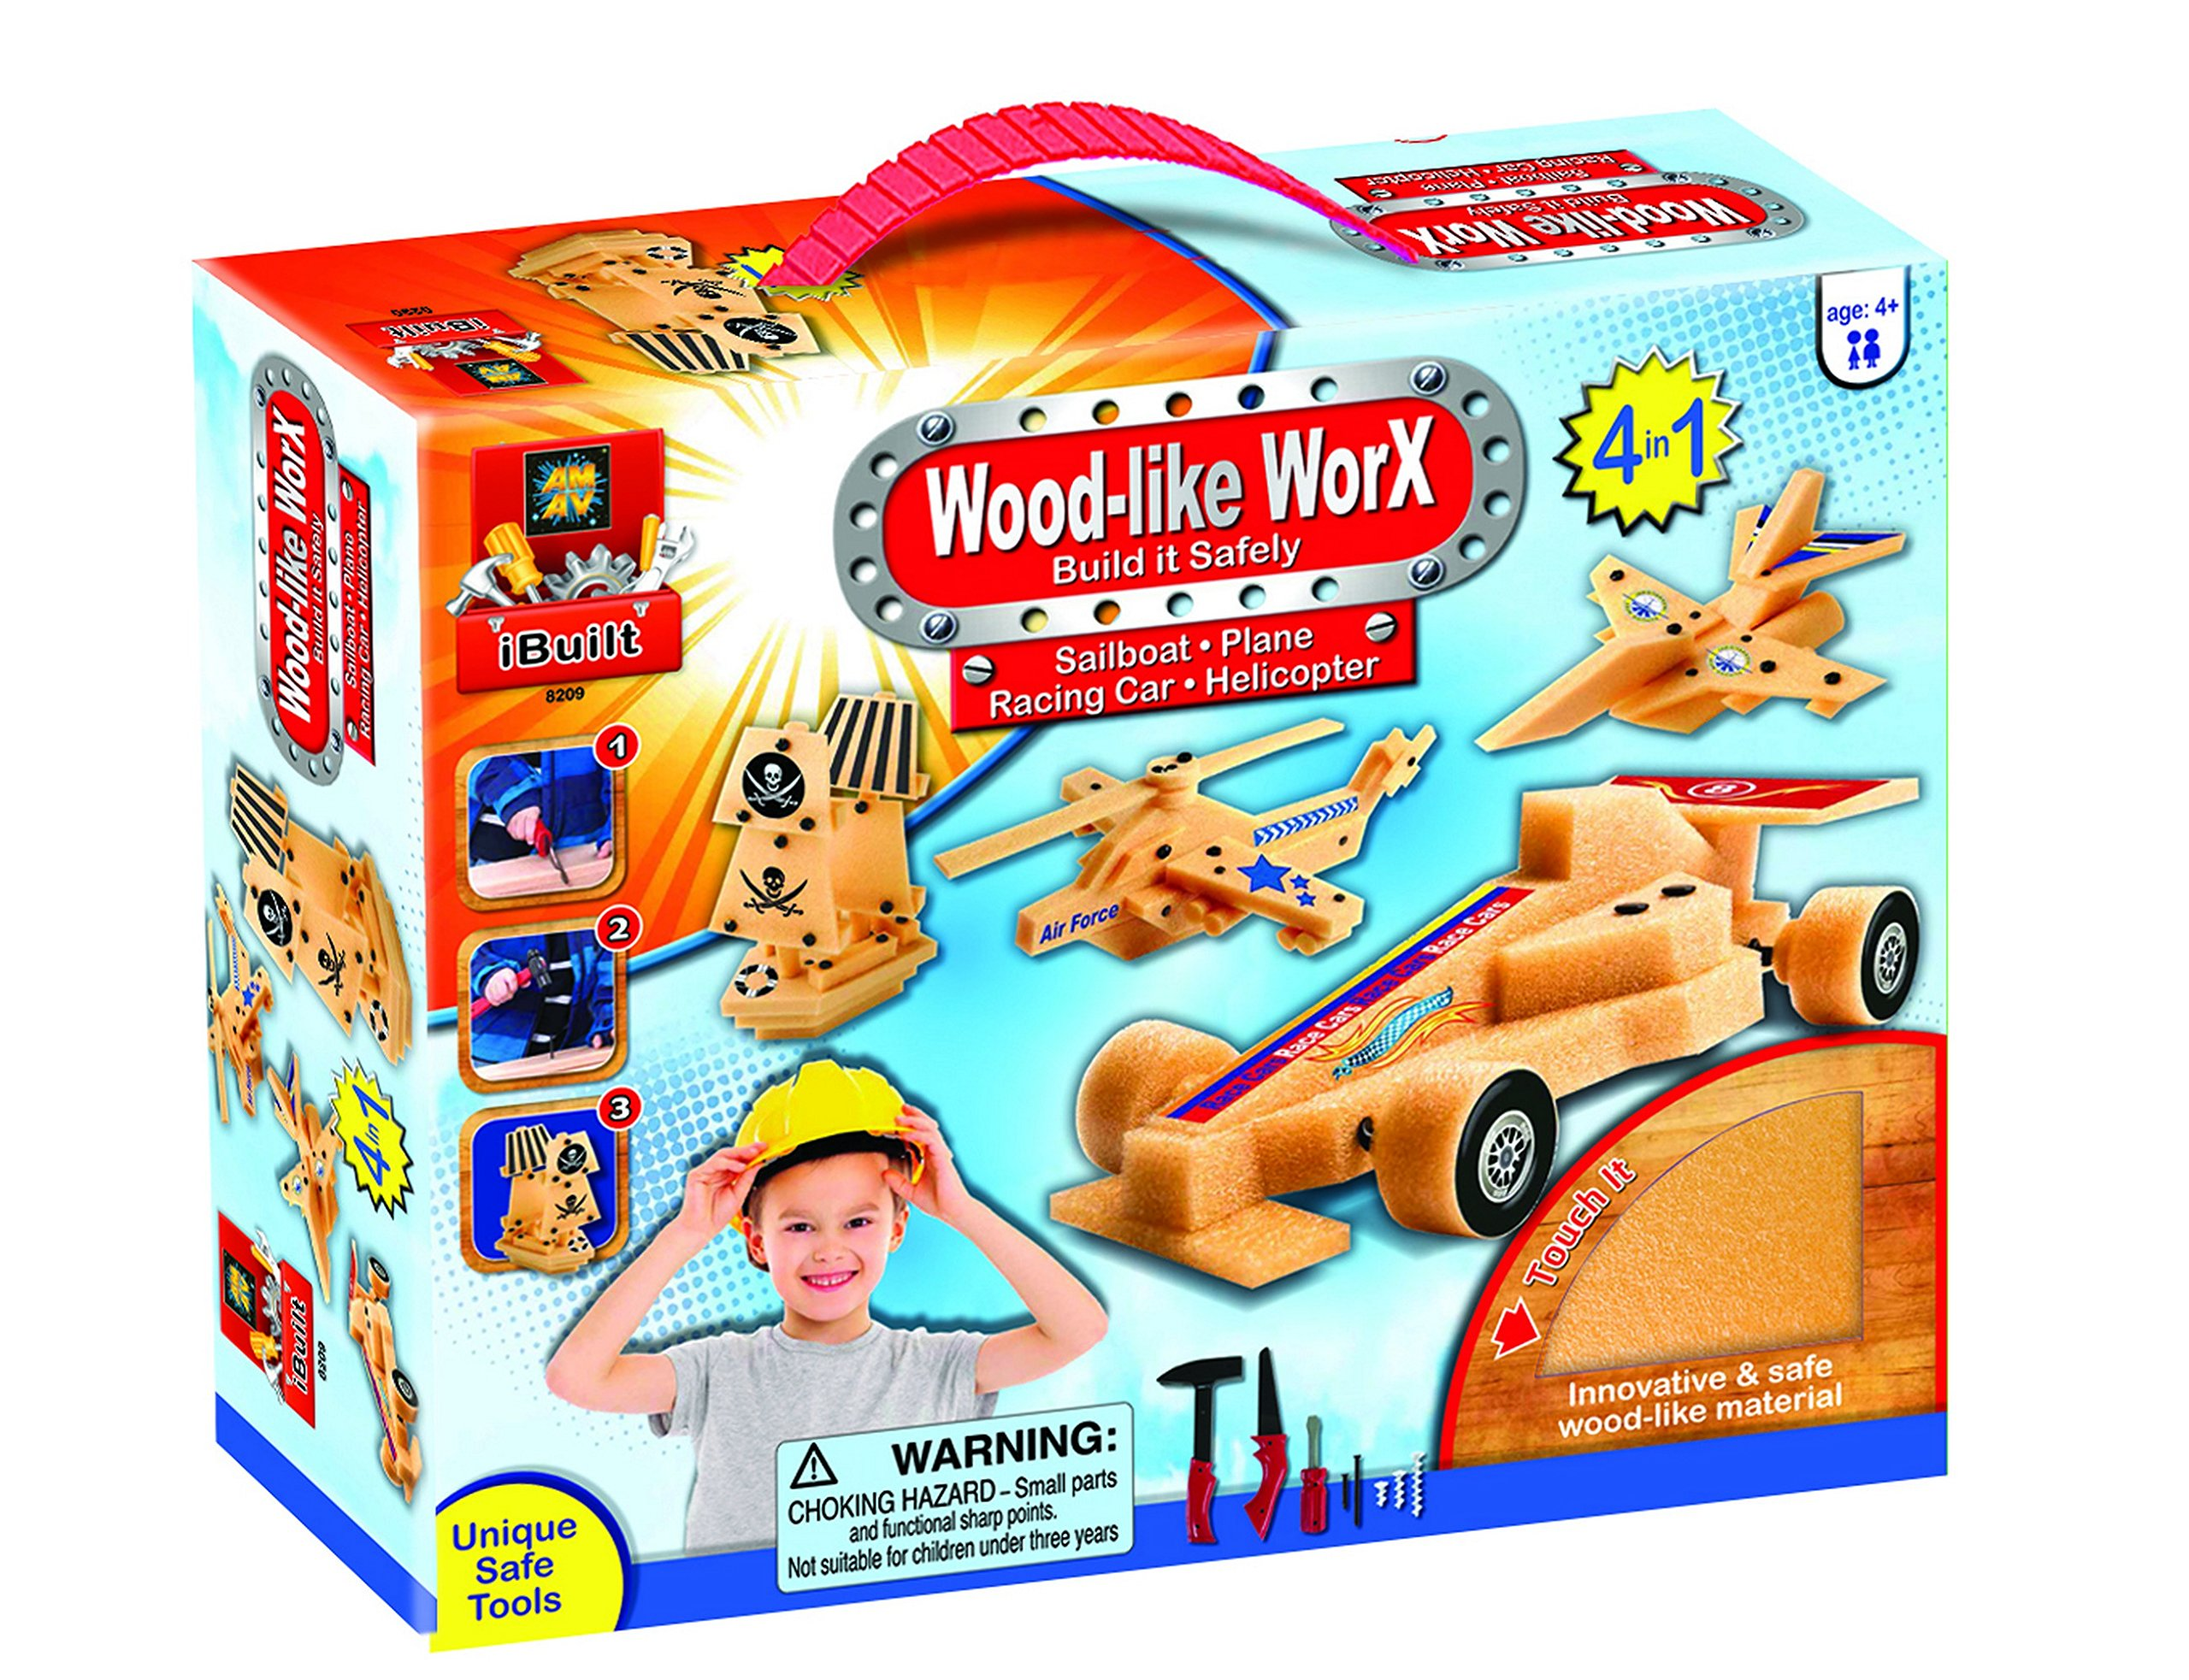 AMAV Toys Wood Like Worx - Build It Safely Multi Color Kit by AMAV Toys